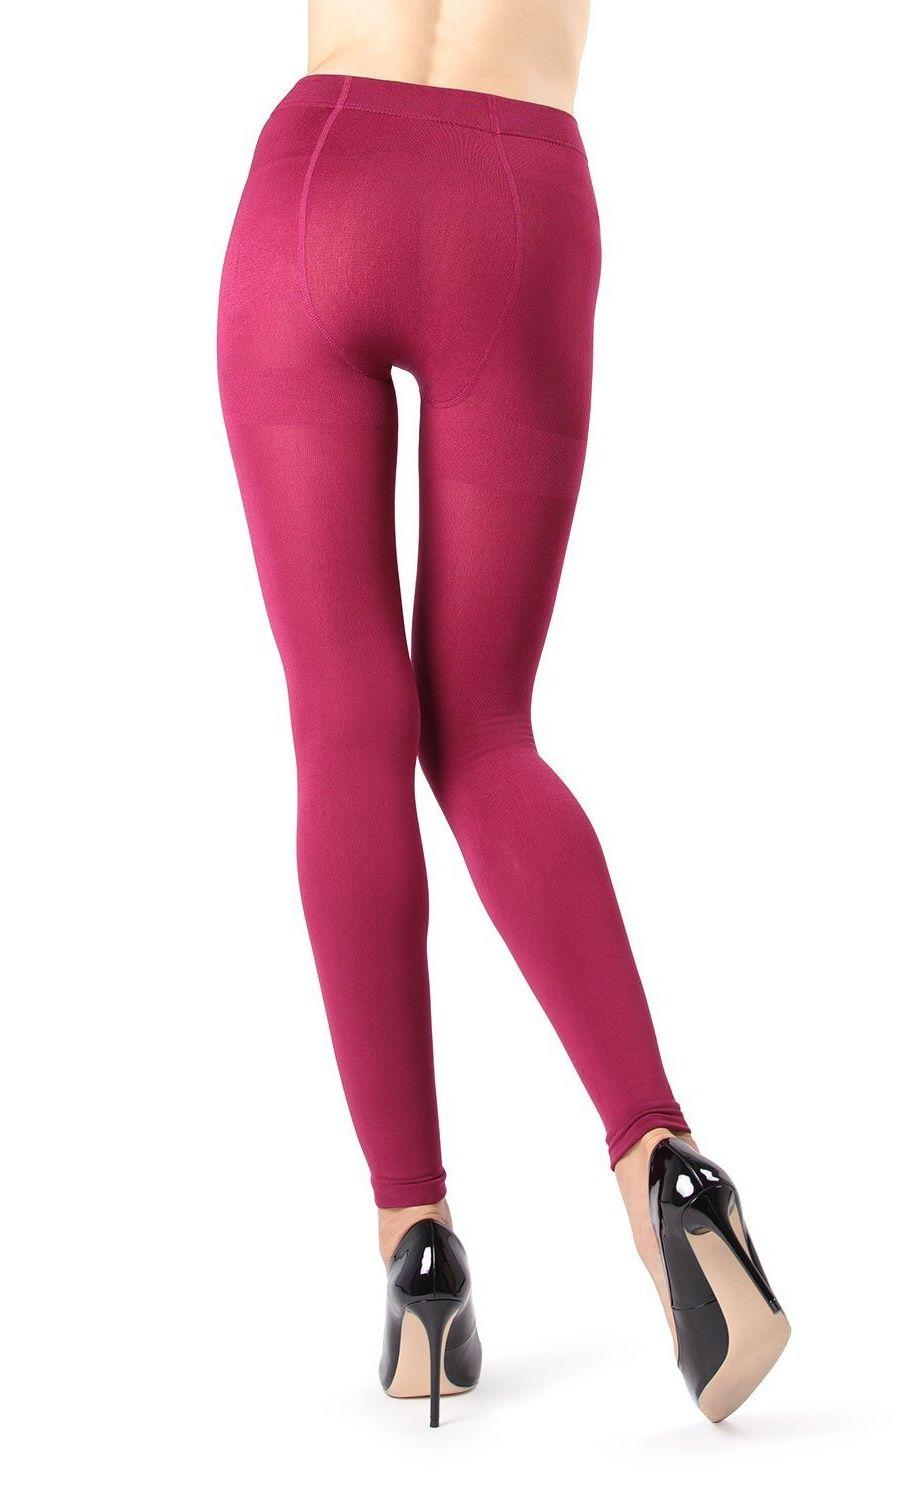 22b59b0c2ab5e Memoi Winter Fleece Footless Tights Women's Hosiery - Pantyhose  Medium/Large / Berry MO 346#Footless, #Tights, #Women